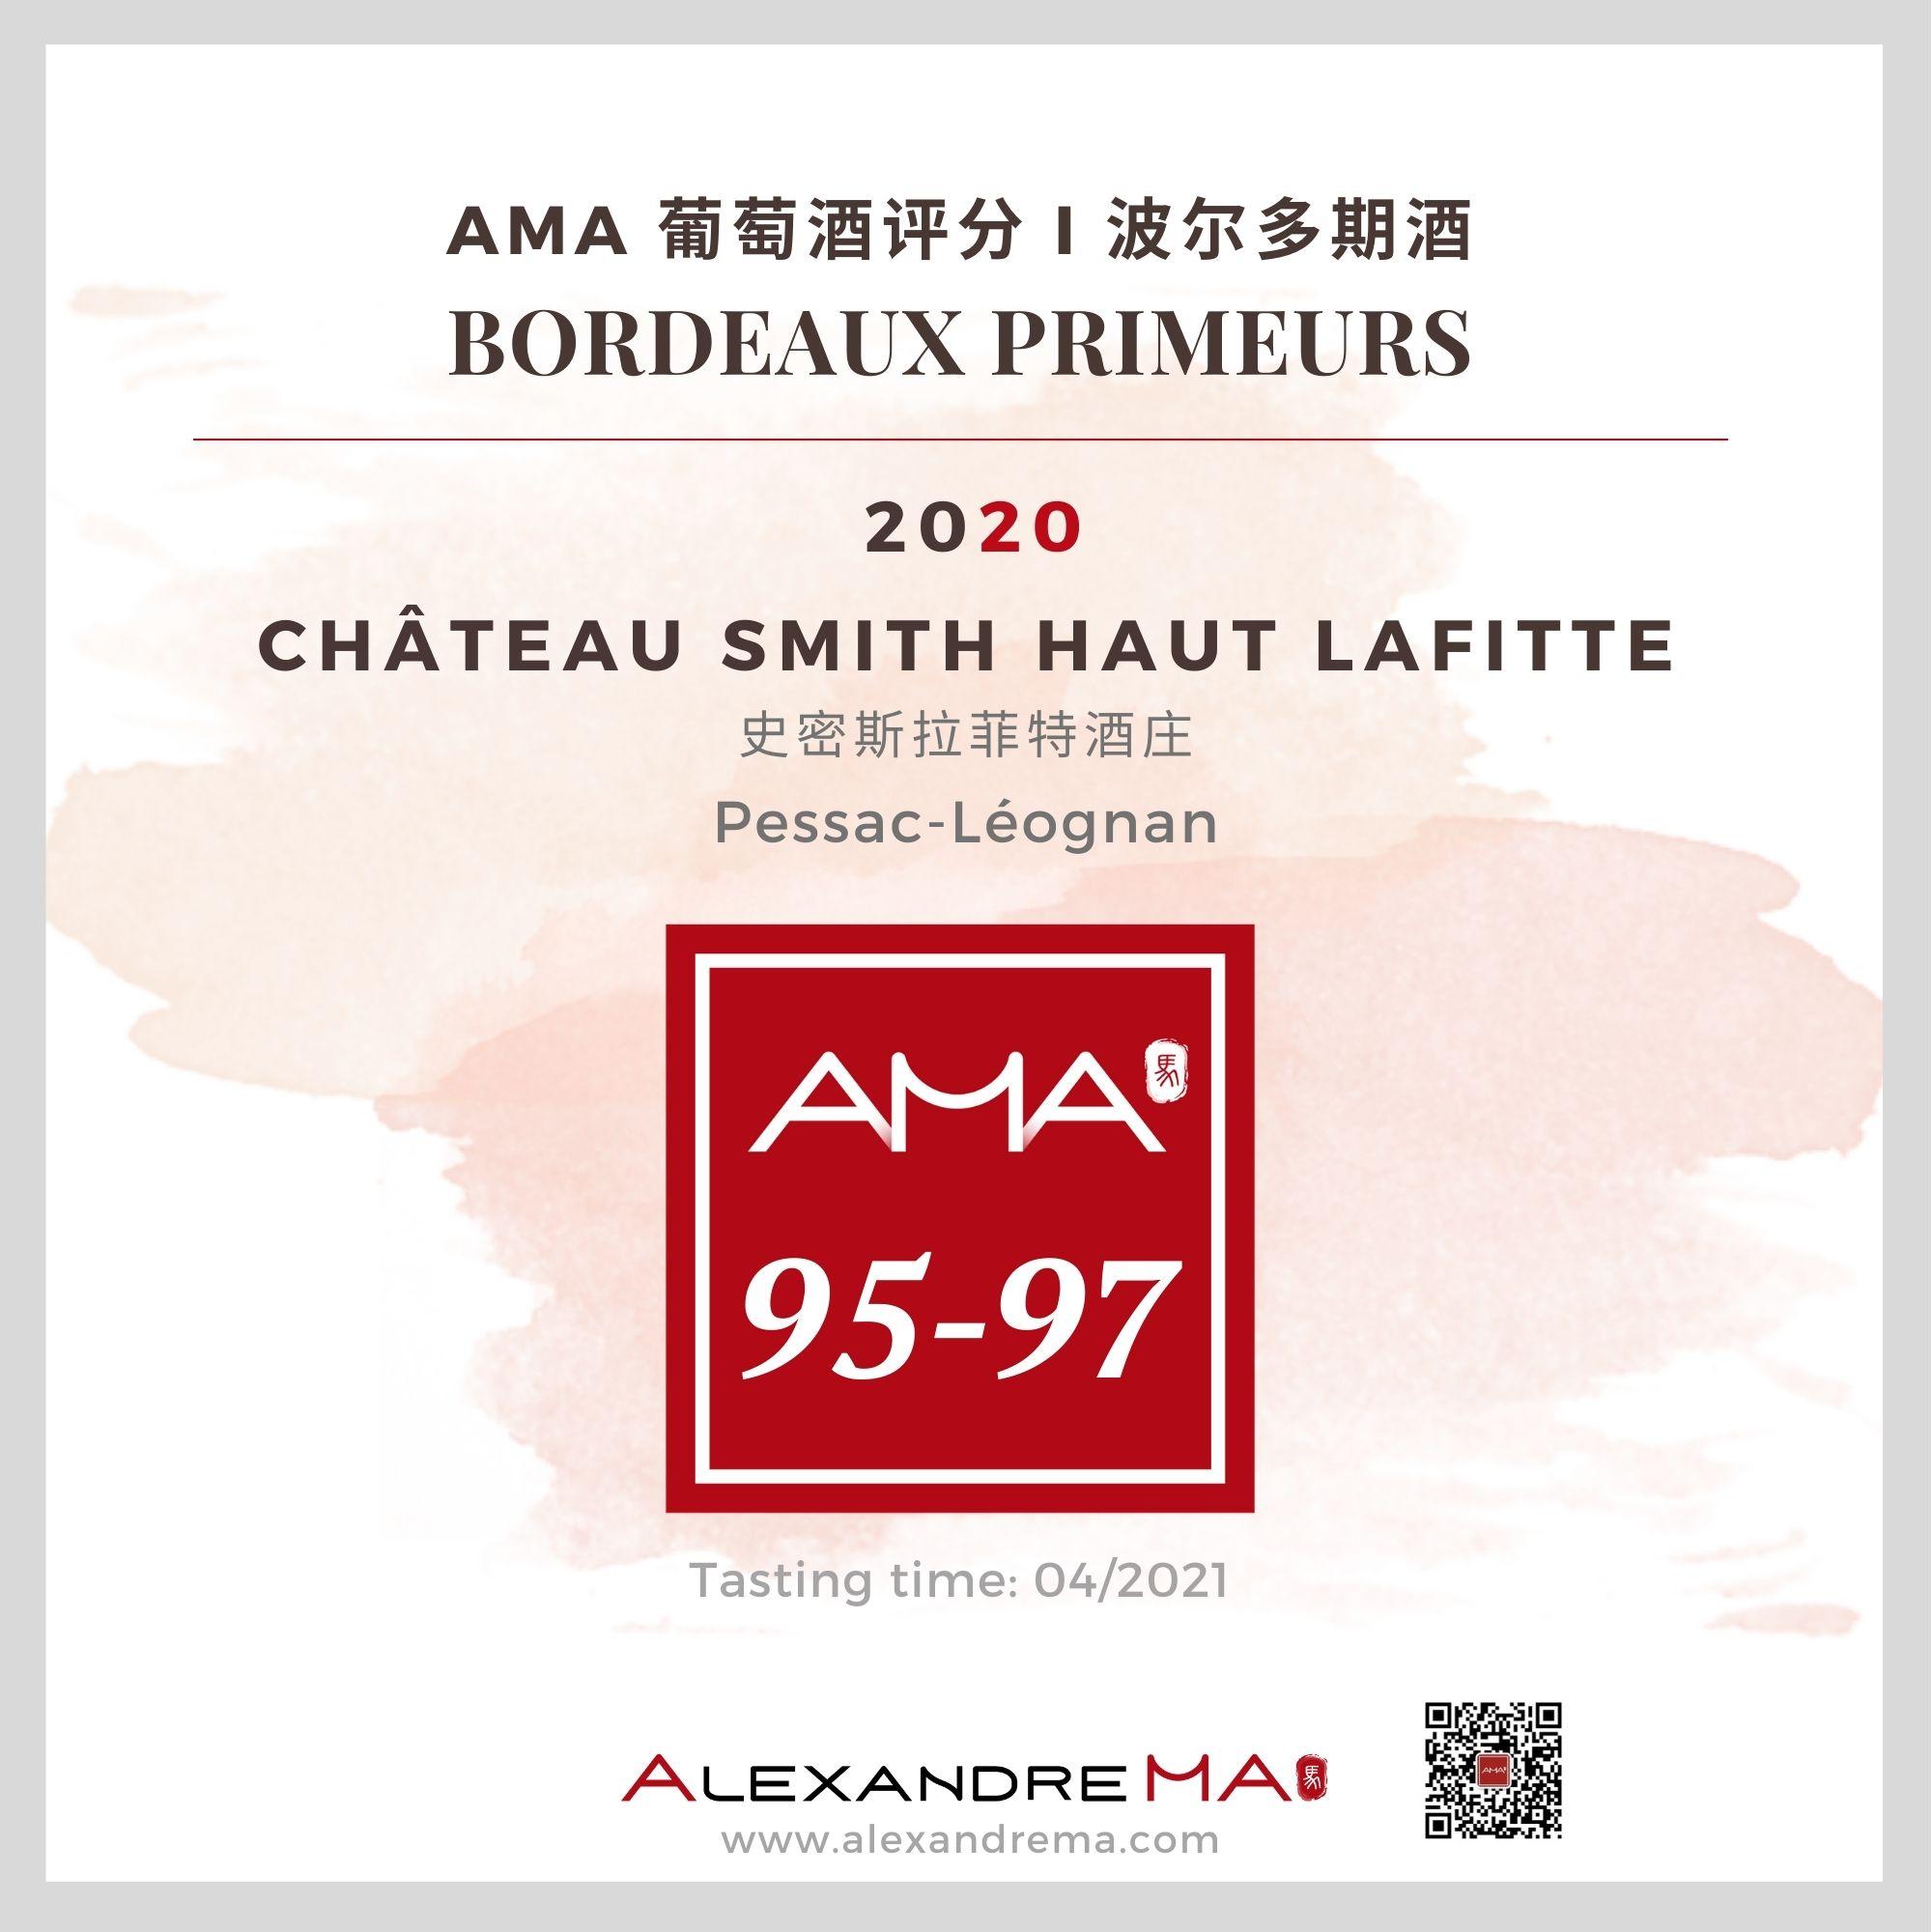 Château Smith Haut Lafitte 2020 史密斯拉菲特酒庄 - Alexandre Ma